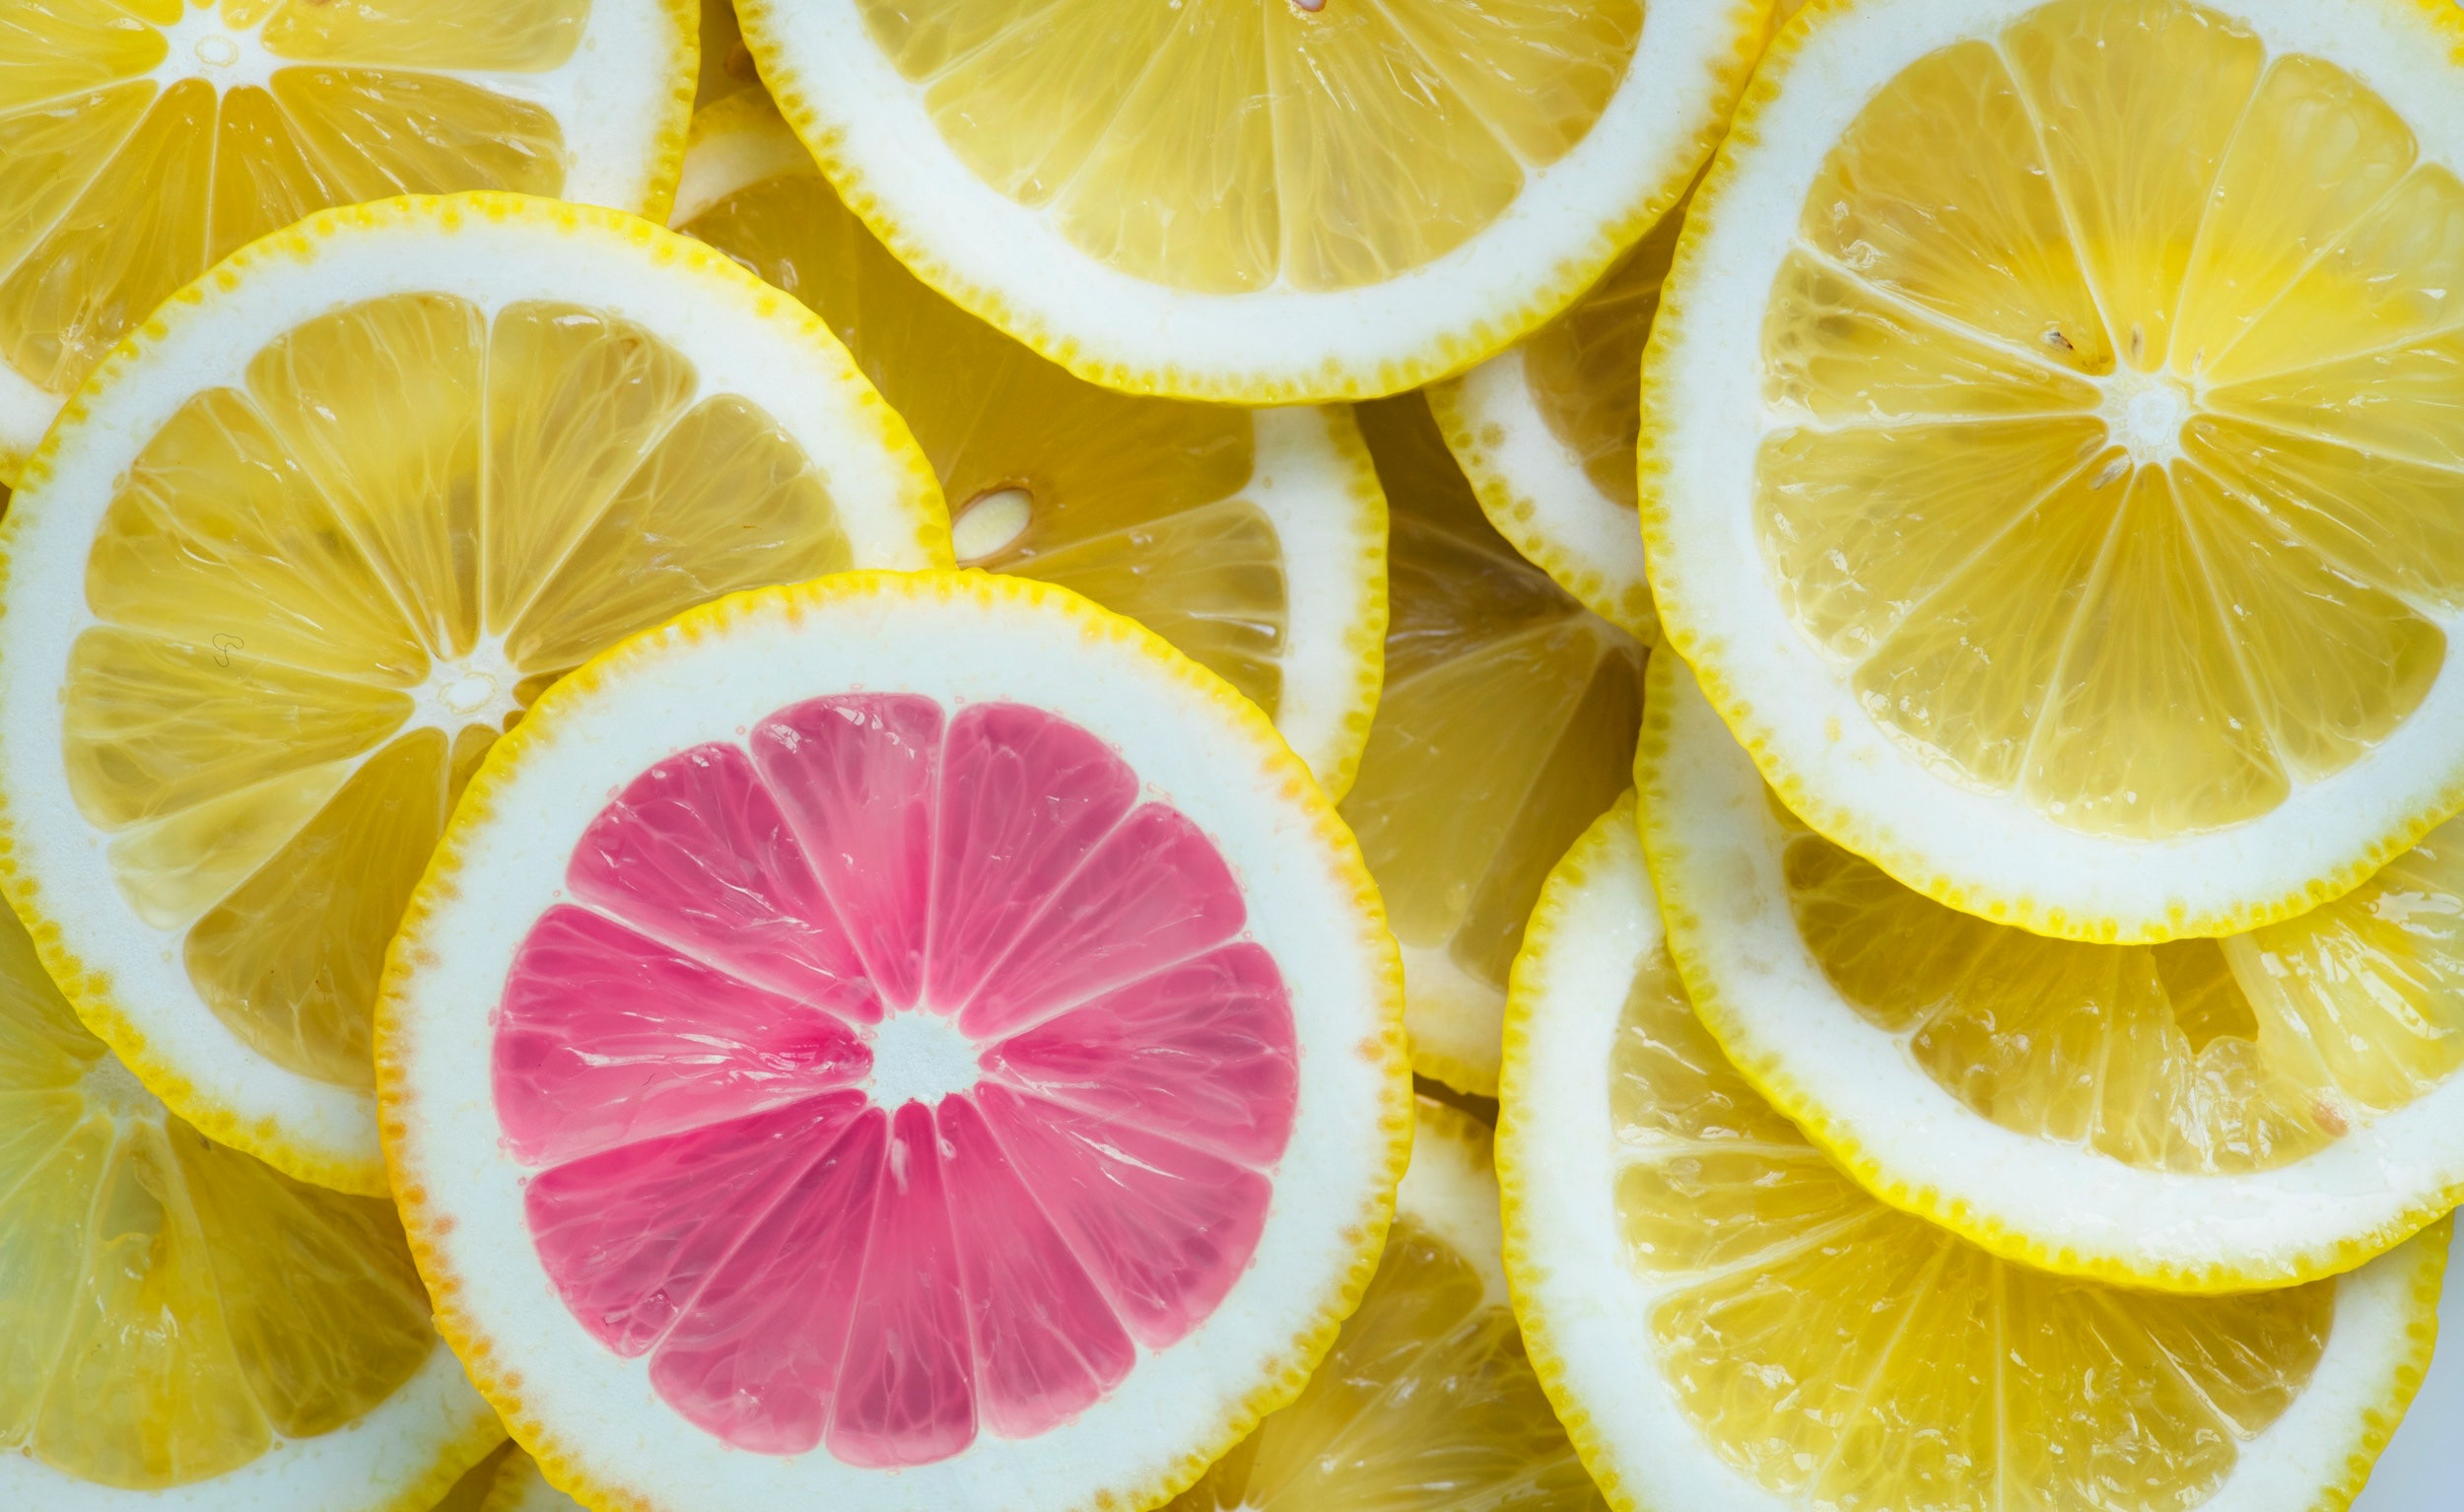 acid-citric-citrus-997725.jpeg